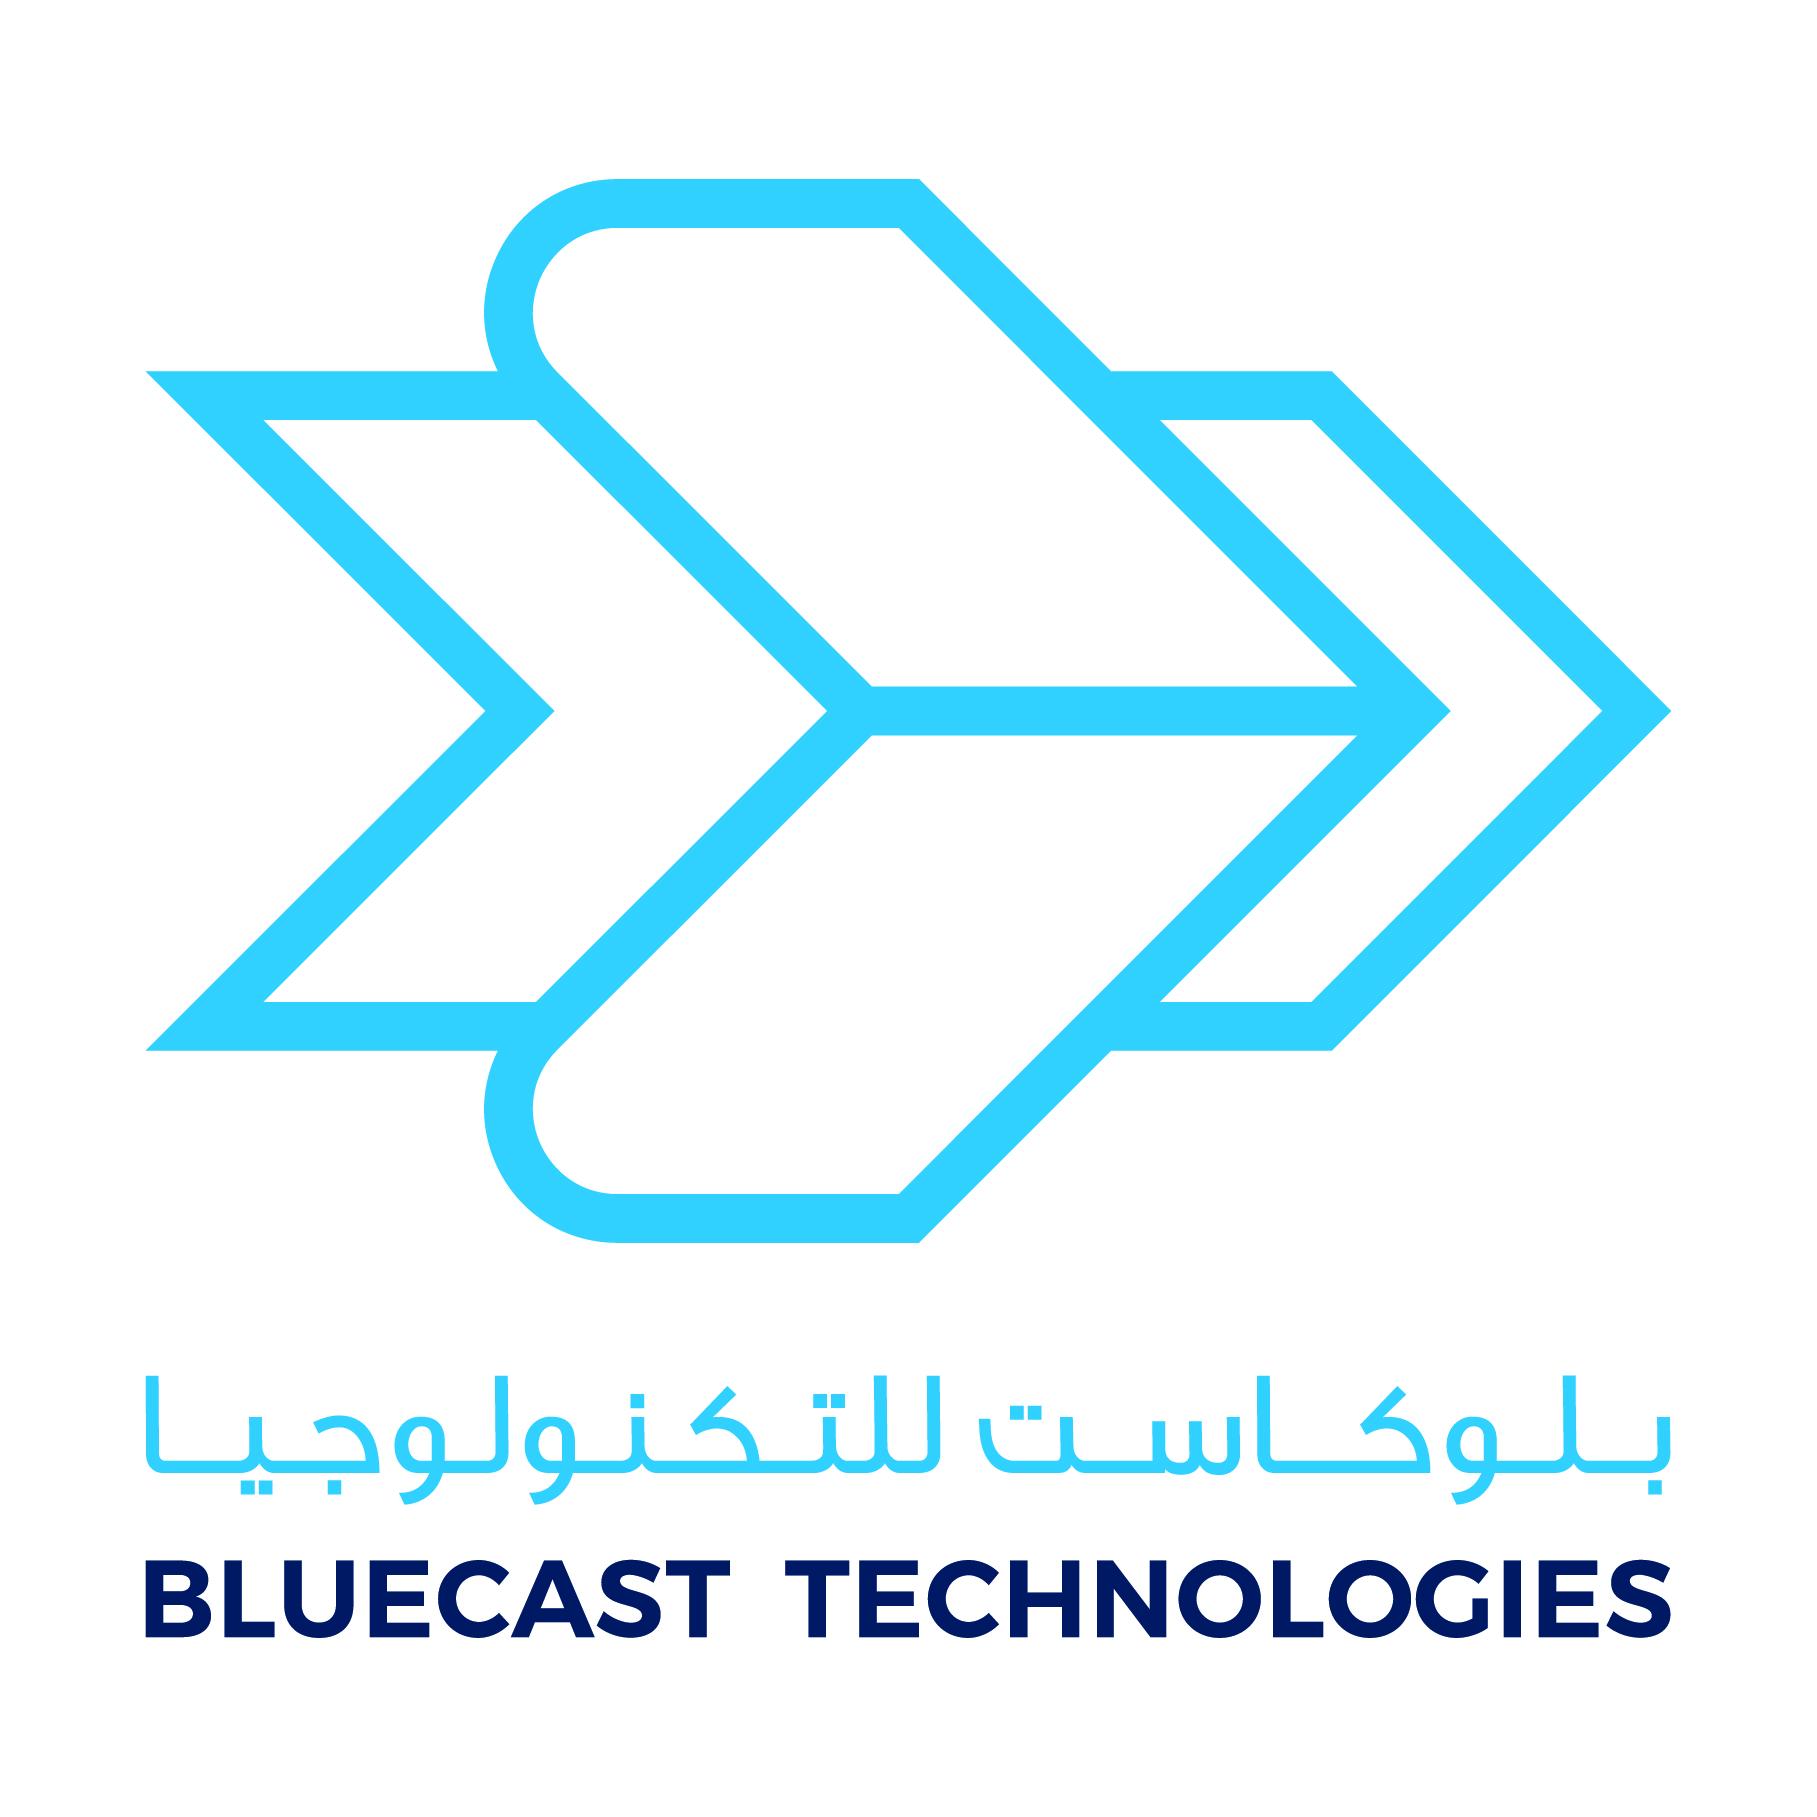 bluecast technologies